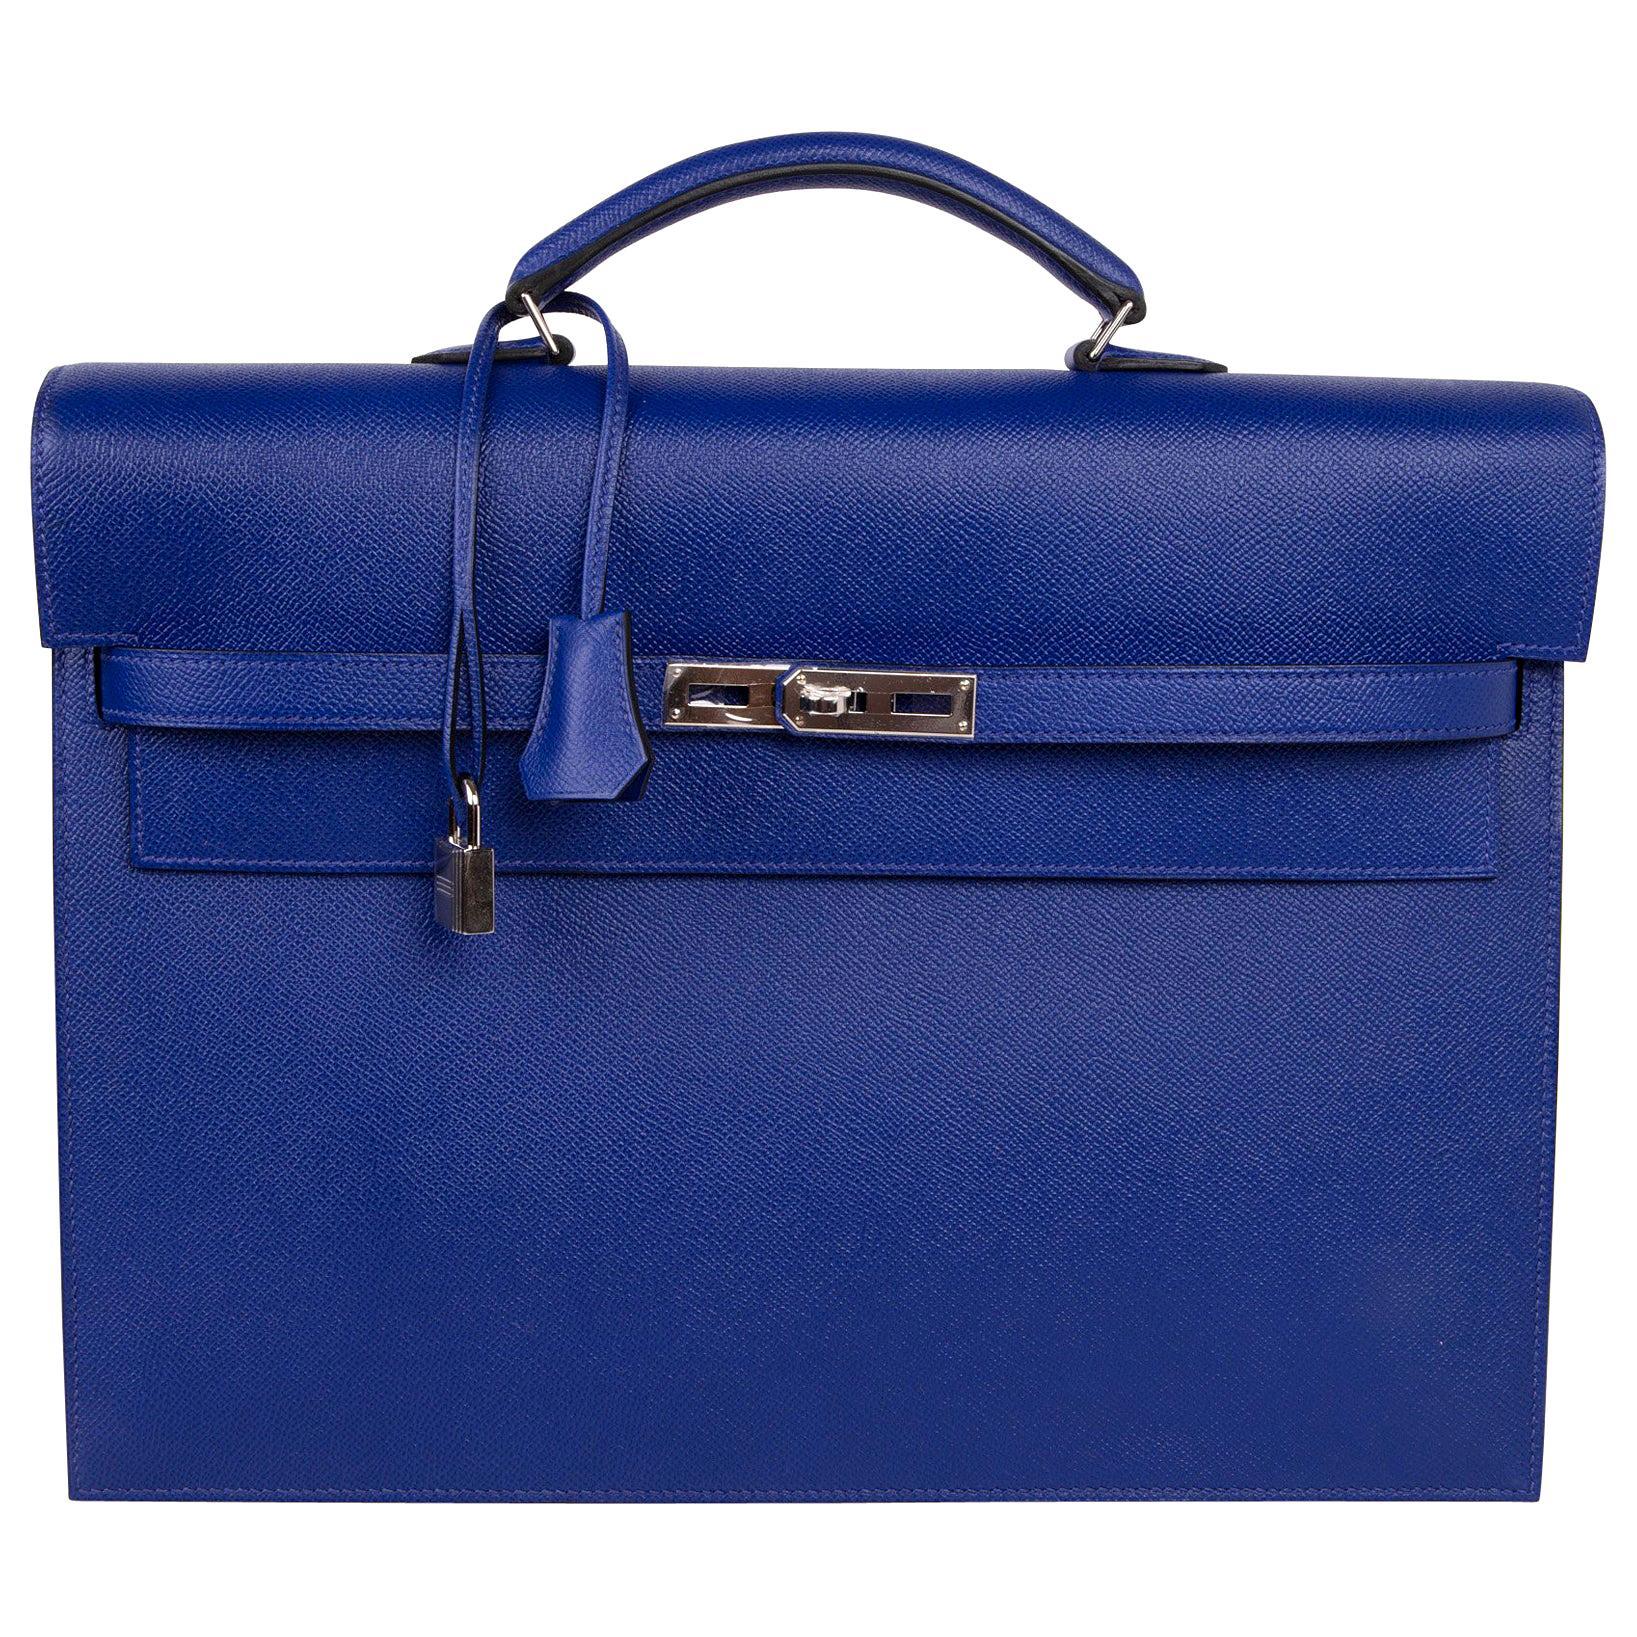 Hermes Kelly Depeche 38 Briefcase Electric Blue Palladium Hardware